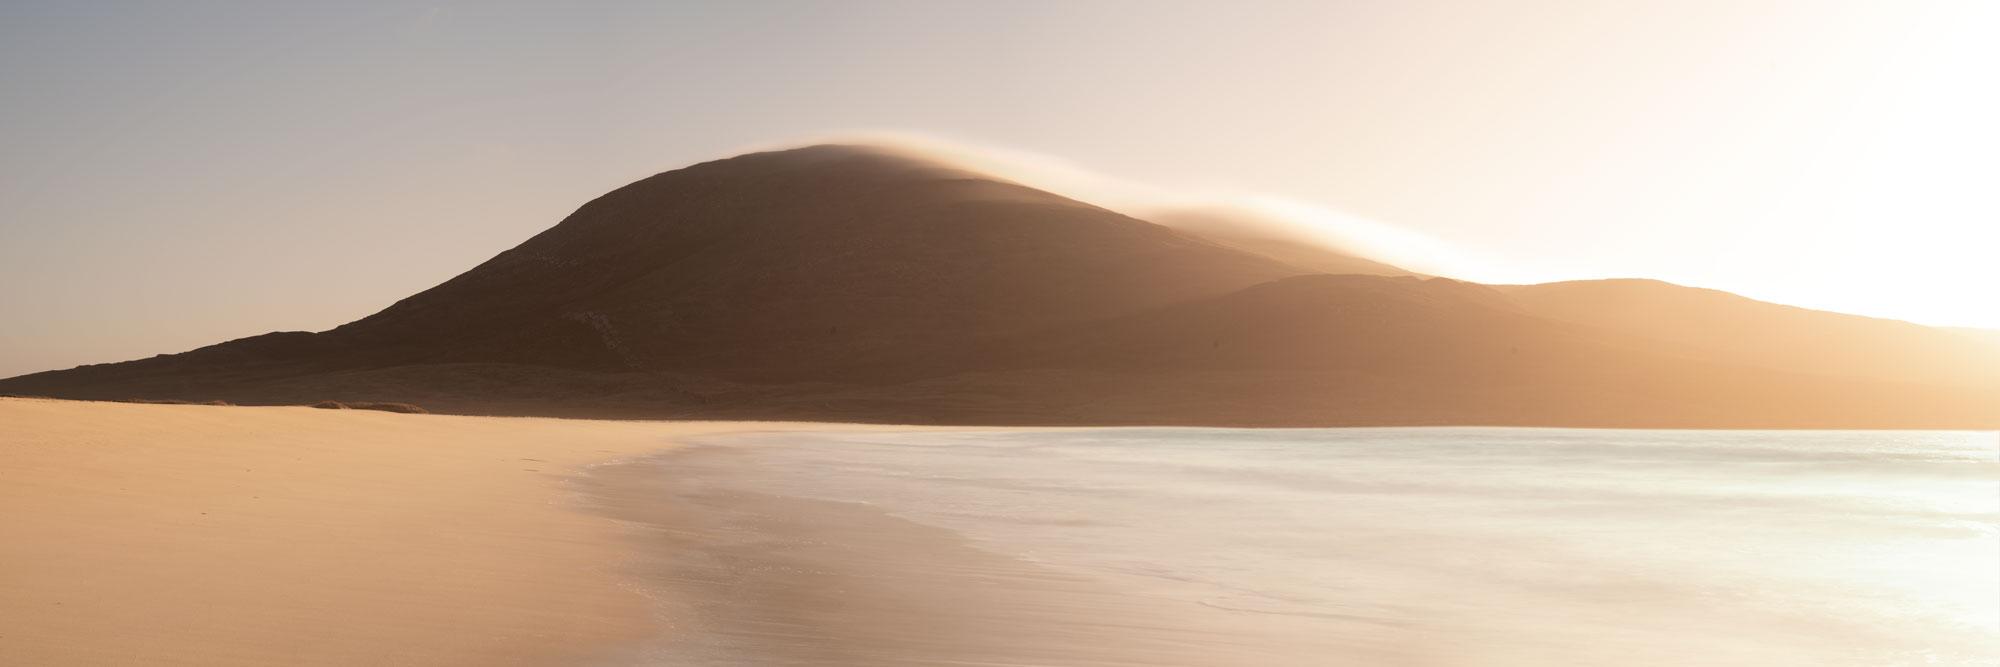 abstract Sgarasta beach Isle of Harris Scotland